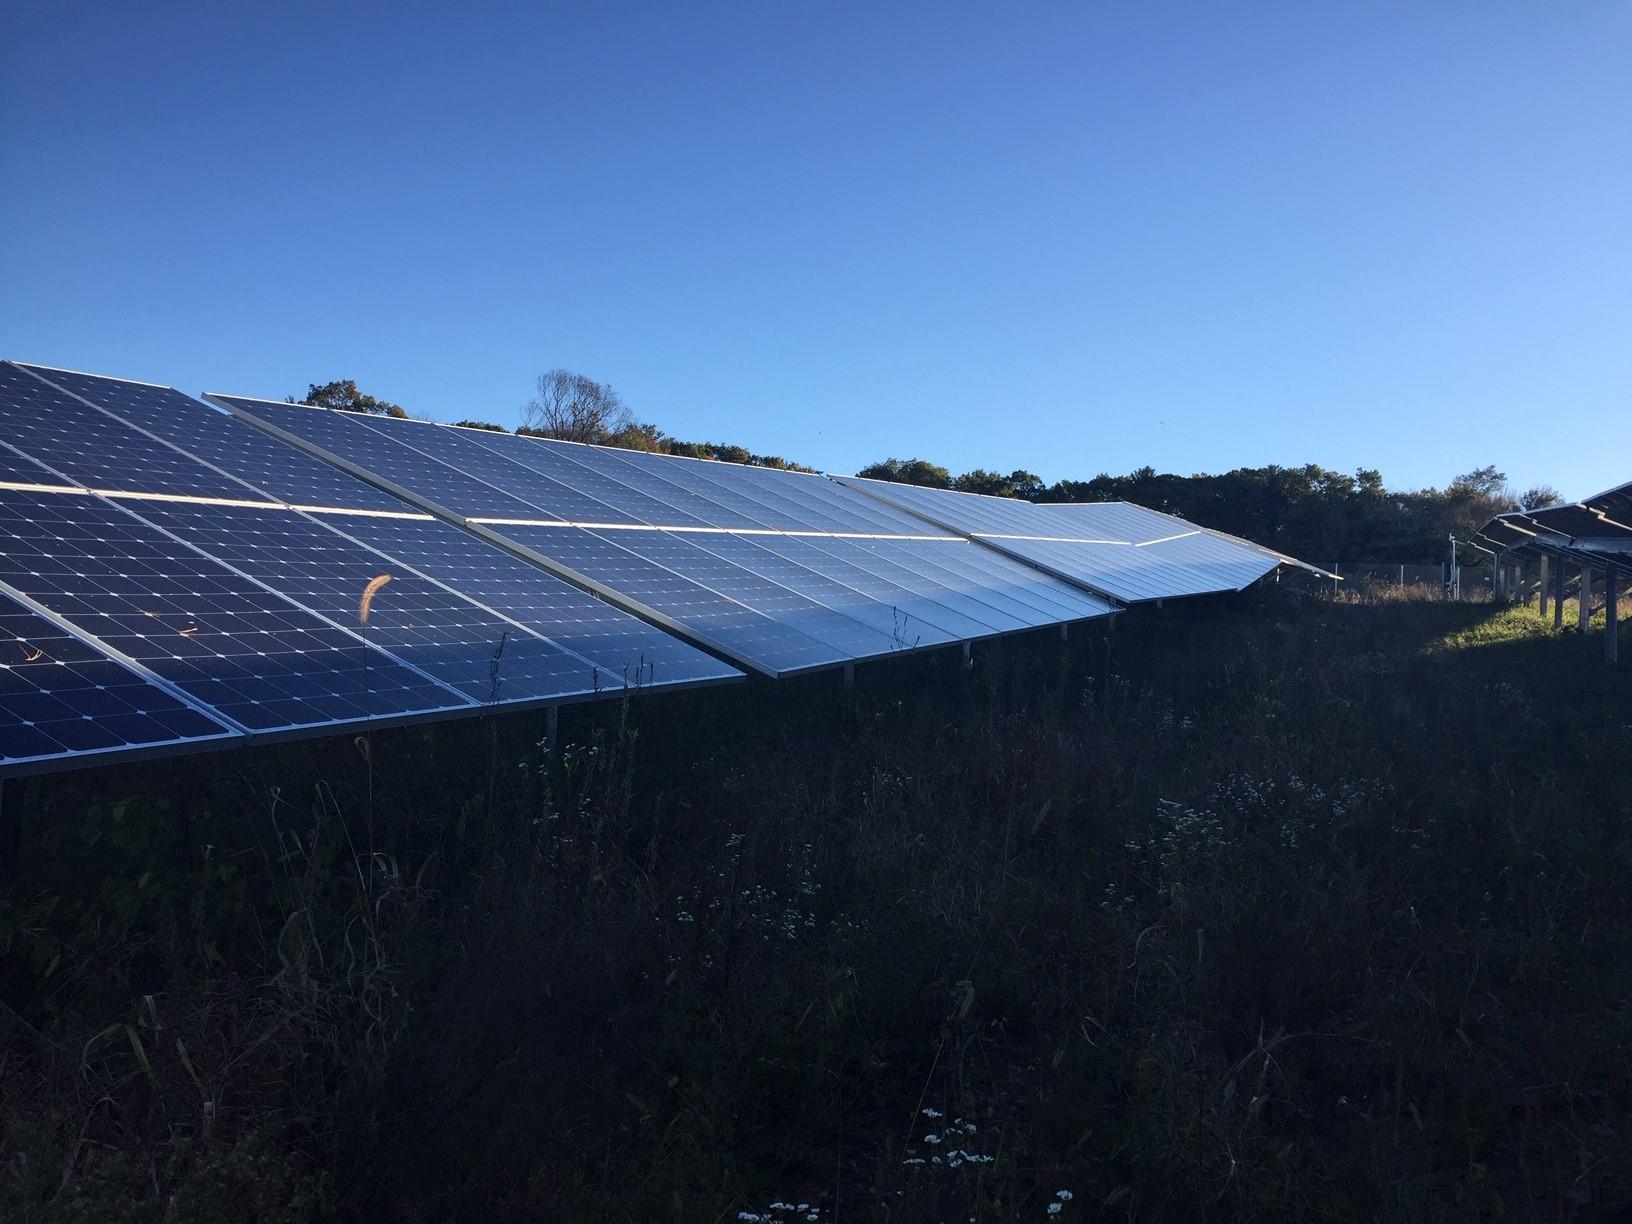 Uxbridge - 2.6 MW DC